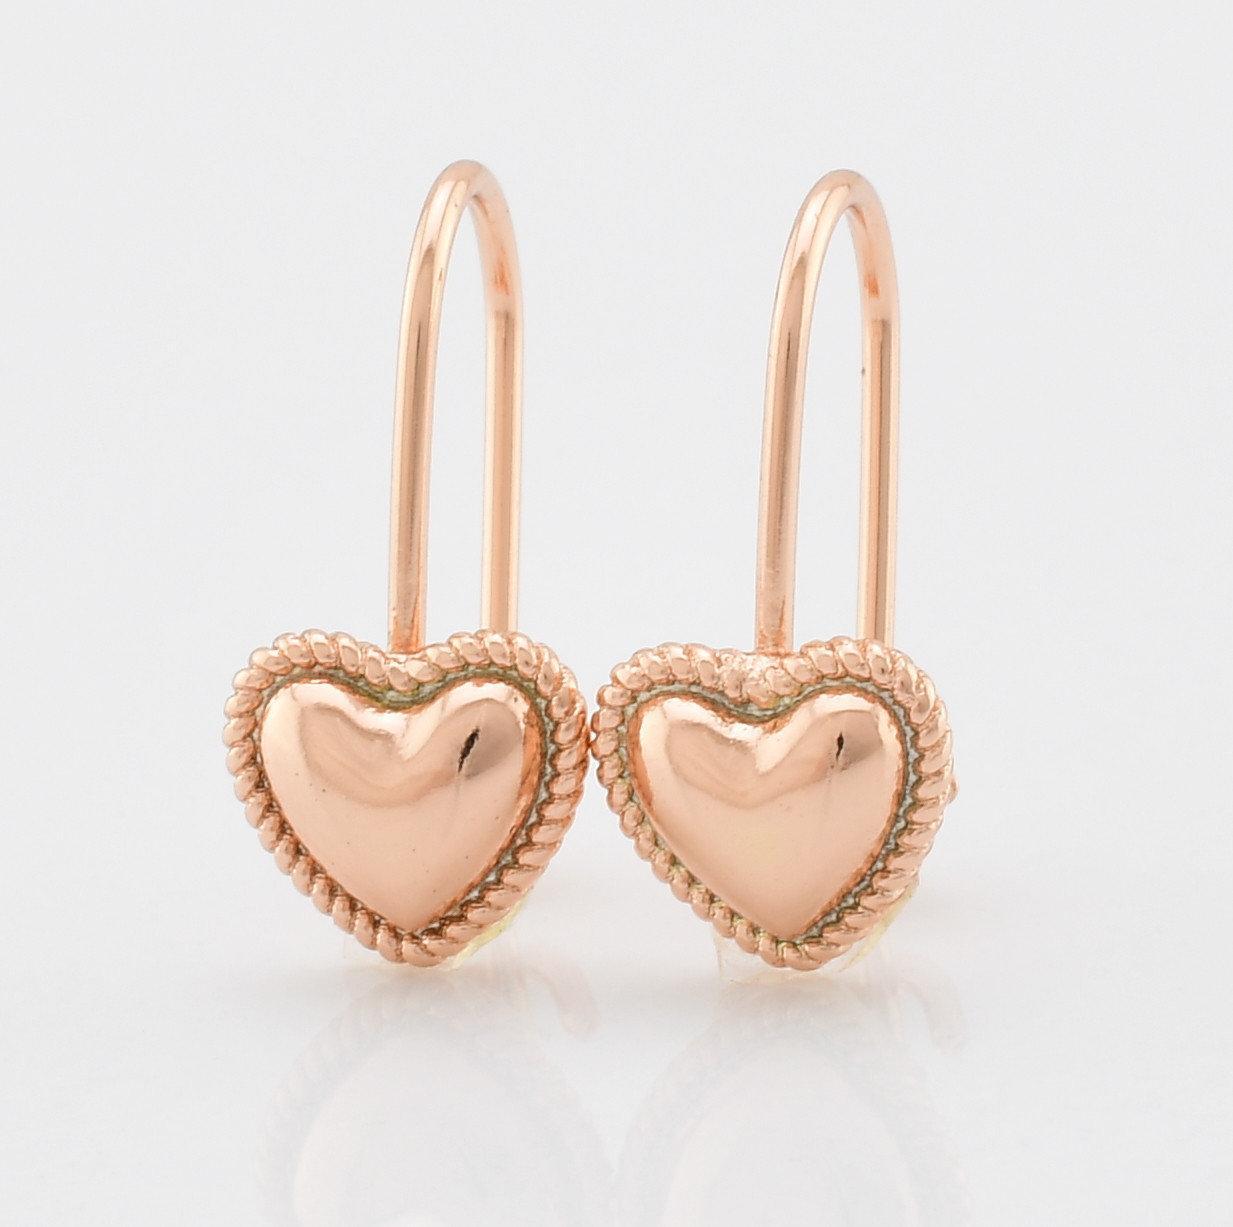 Серьги маленькие сердечки классика позолота